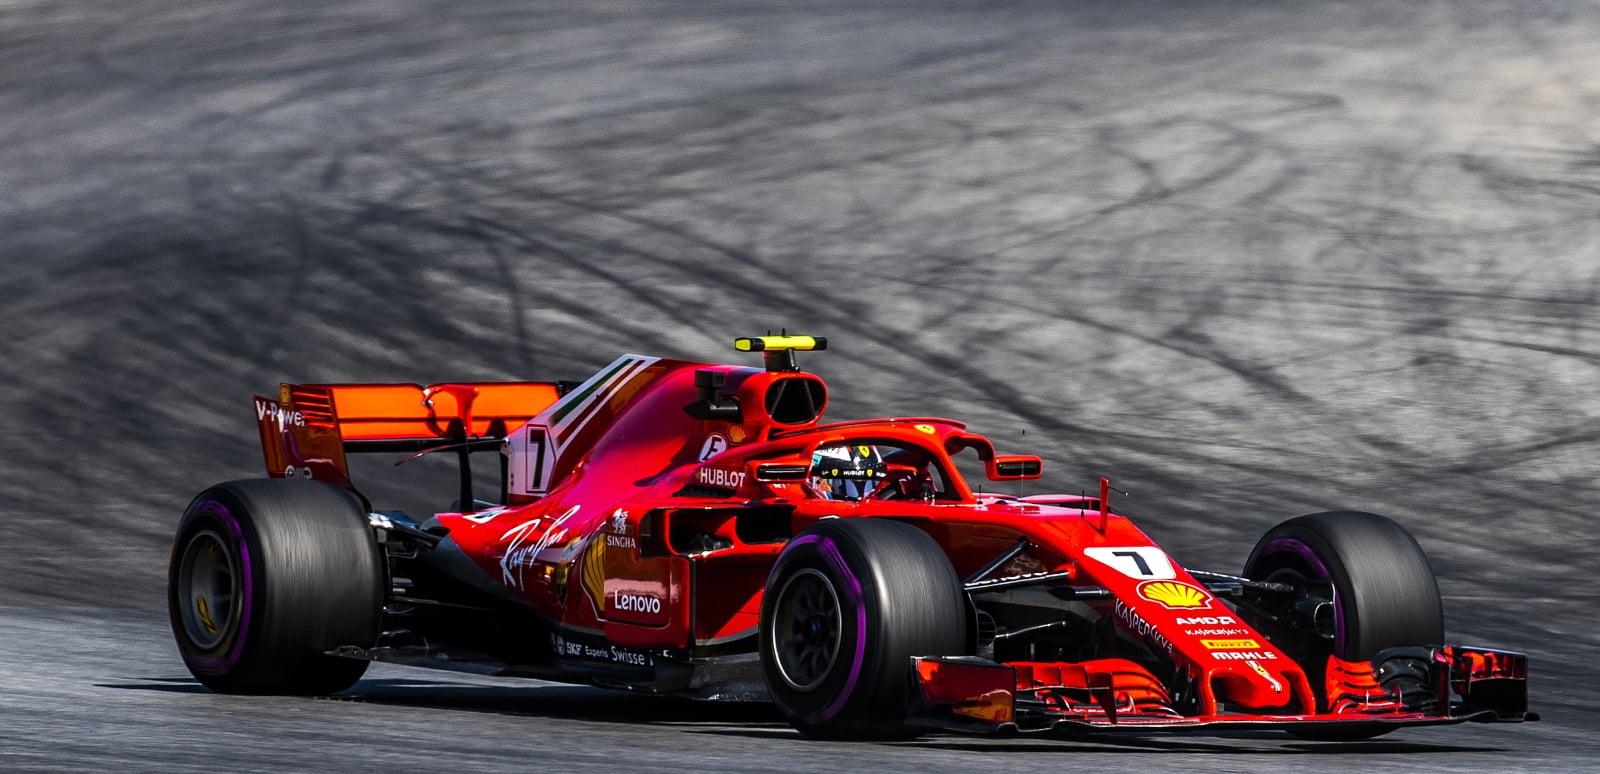 Grad Prix Formuły 1. fot. EPA/SRDJAN SUKI